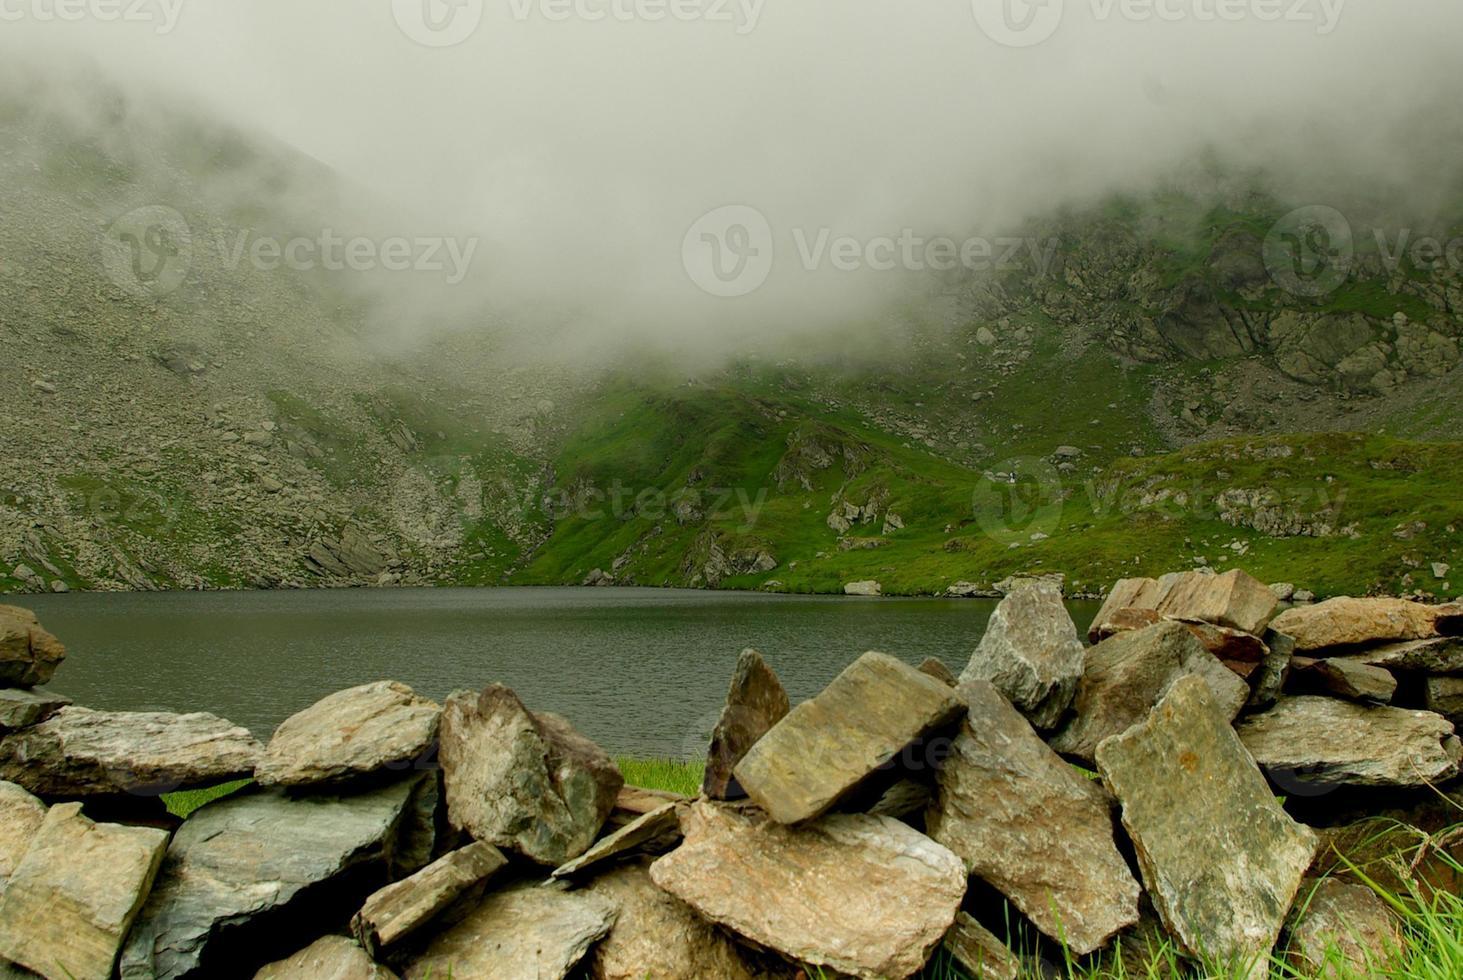 lago de cabra - lago de montanha foto